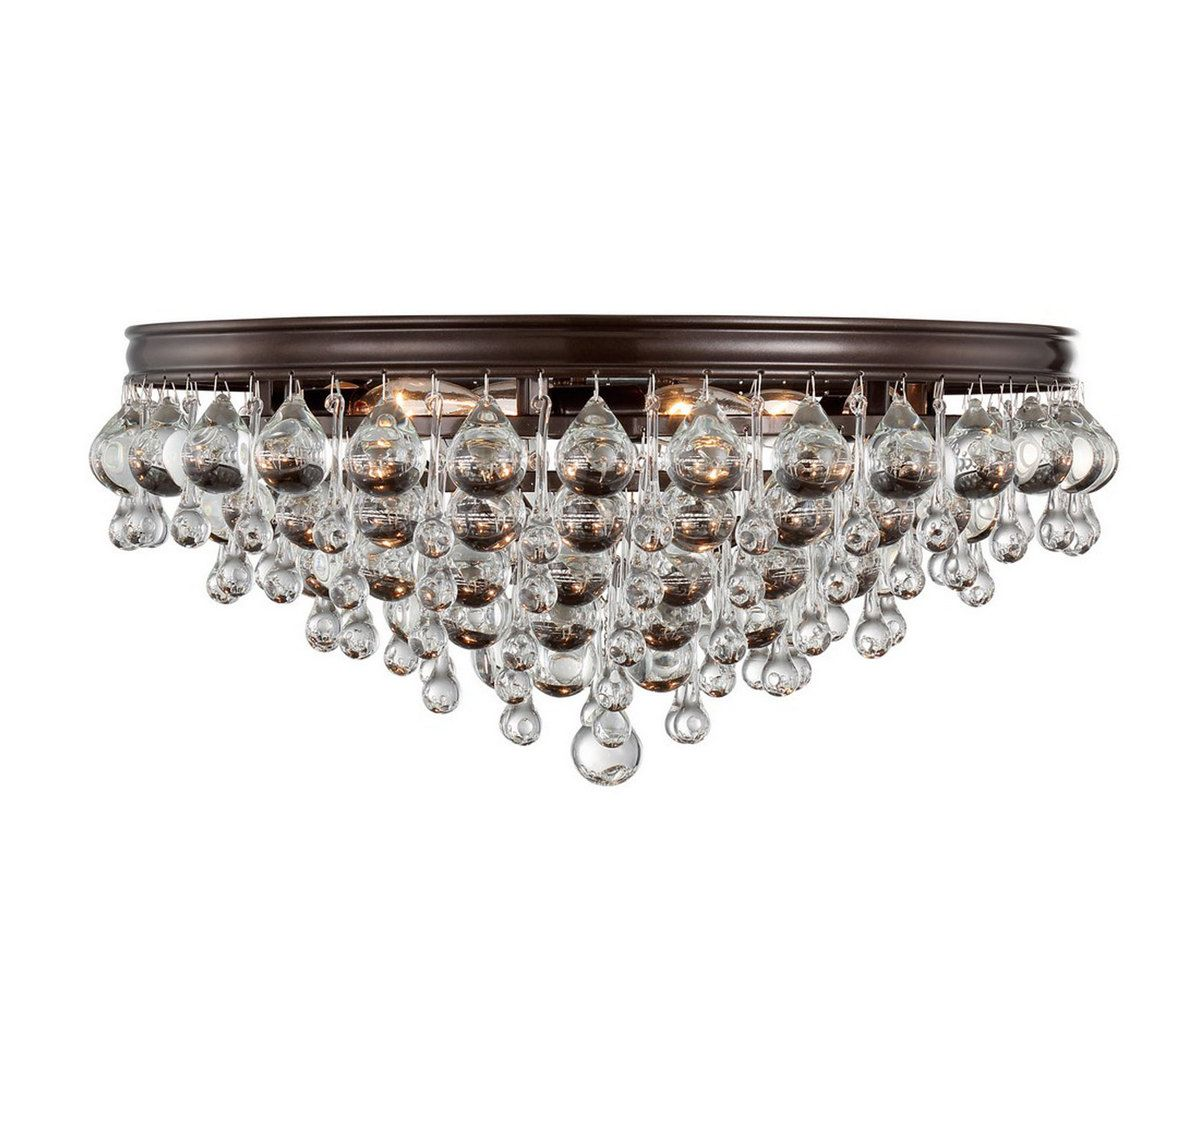 Crystorama Calypso 6 Light Crystal Teardrop Vibrant Flush Mount In Bronze